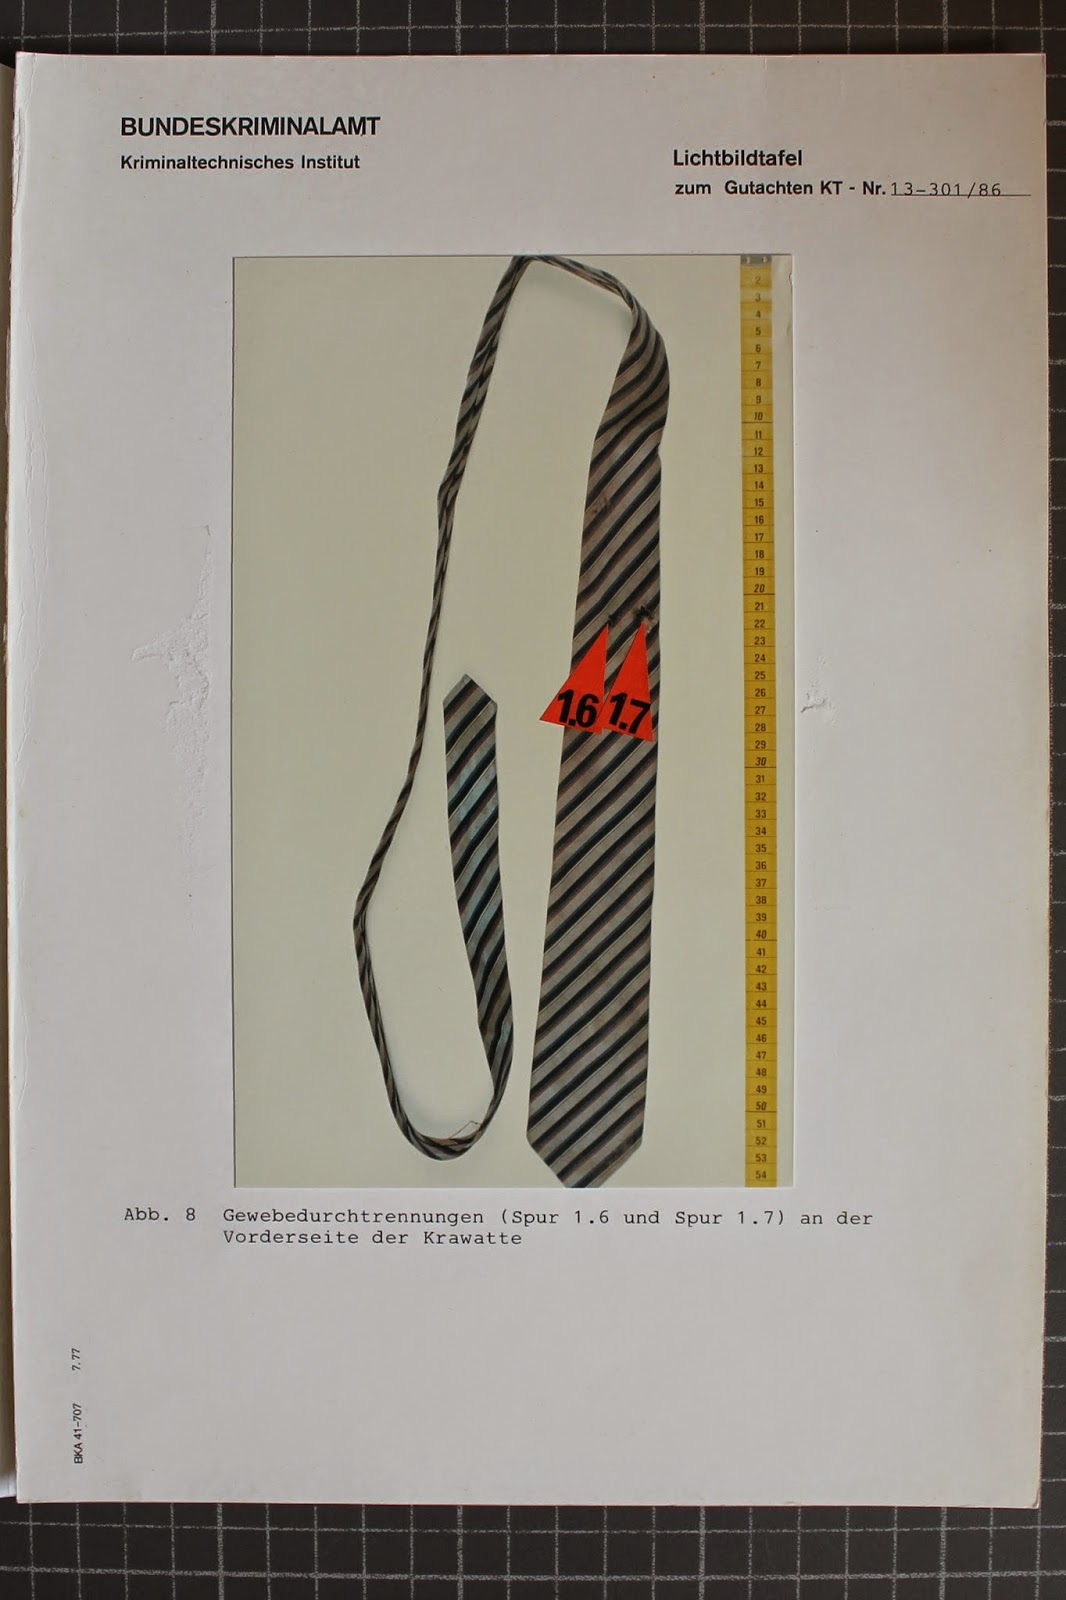 Olof Palmes slips